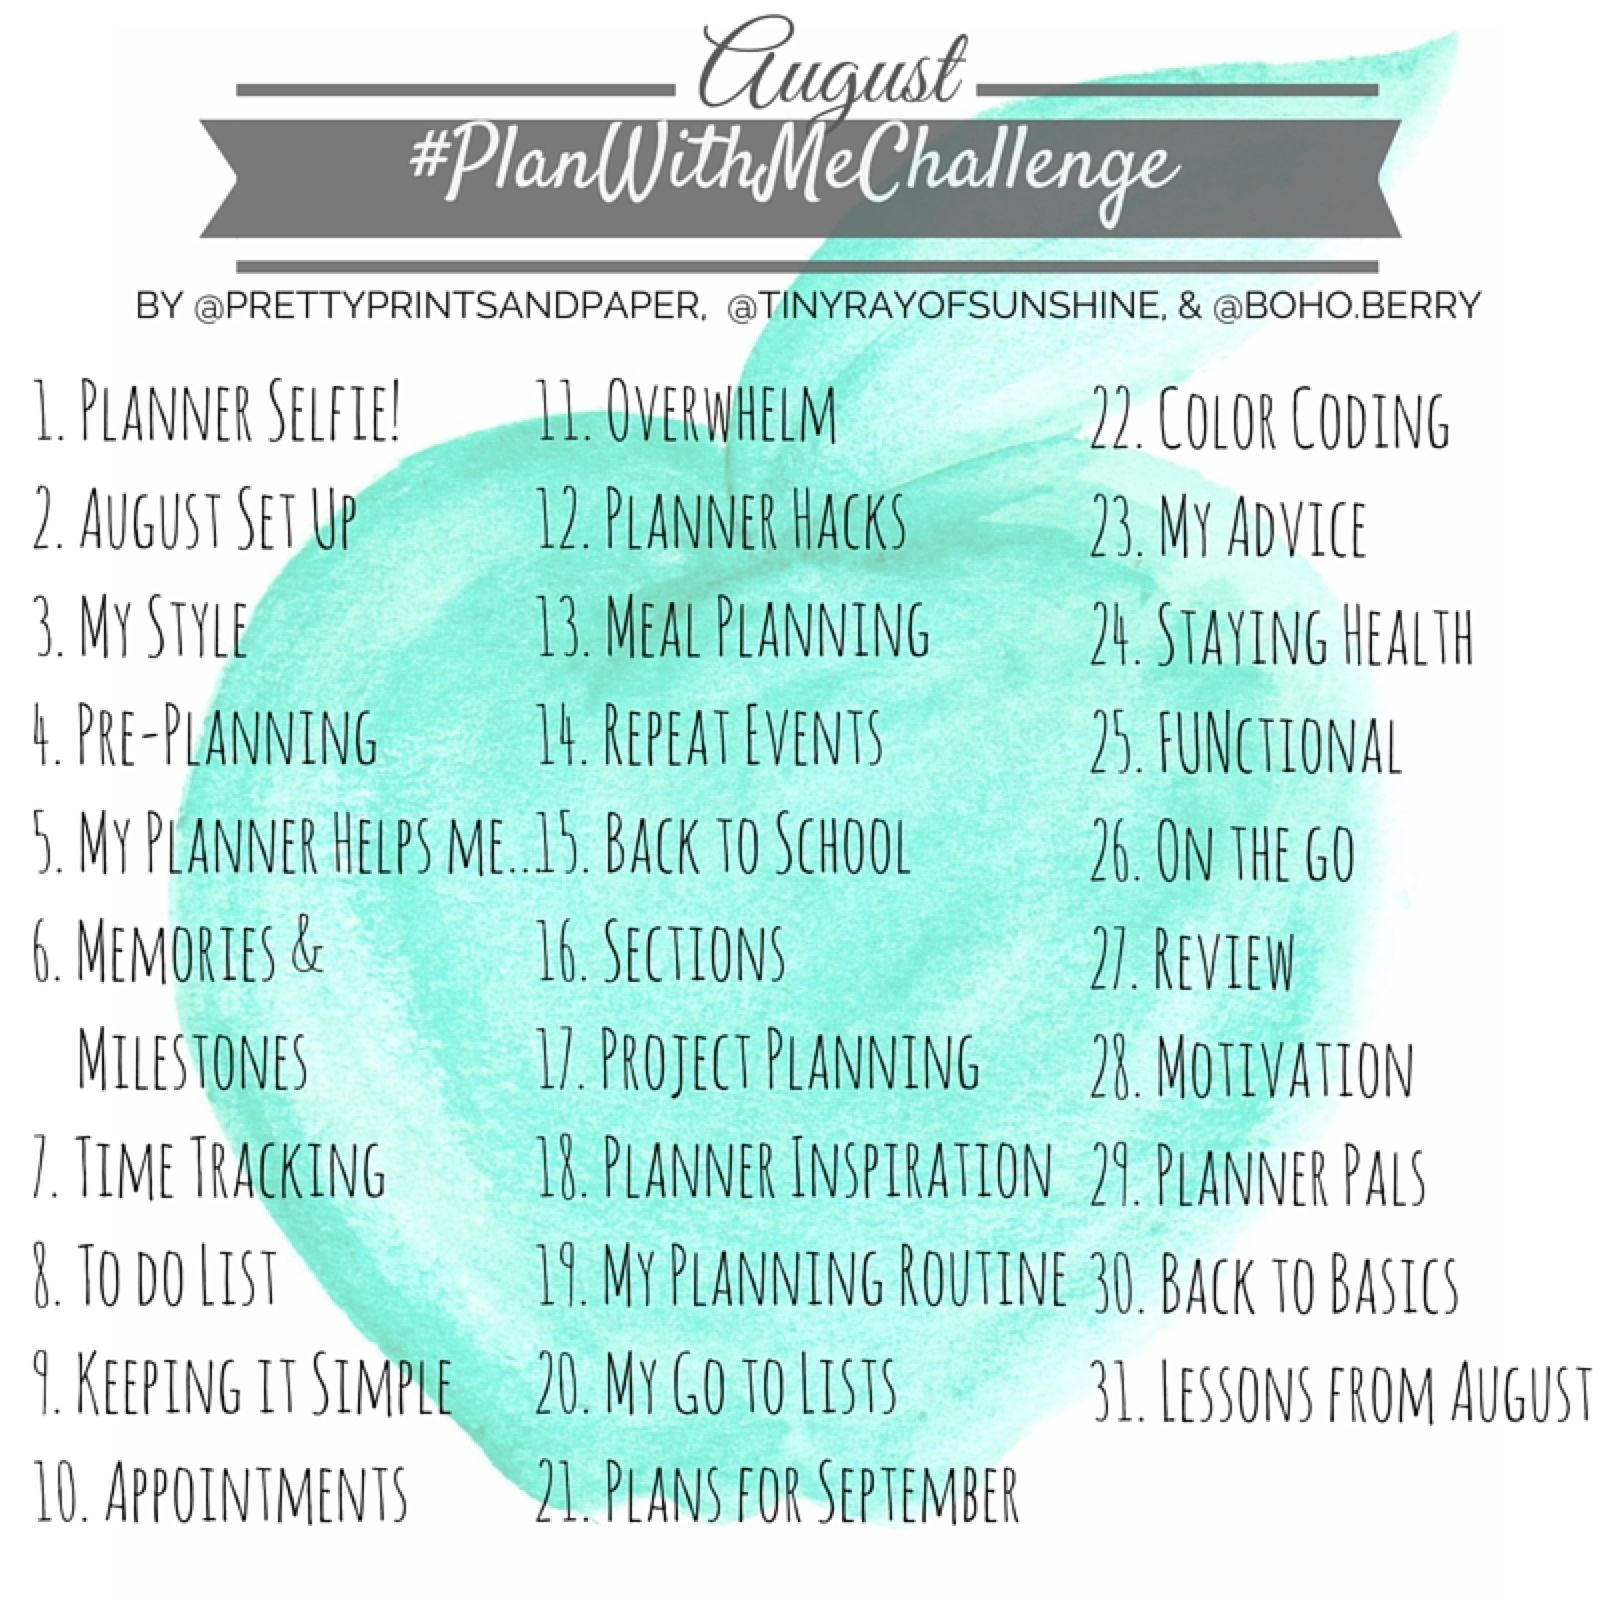 #PlanWithMeChallenge August 2016